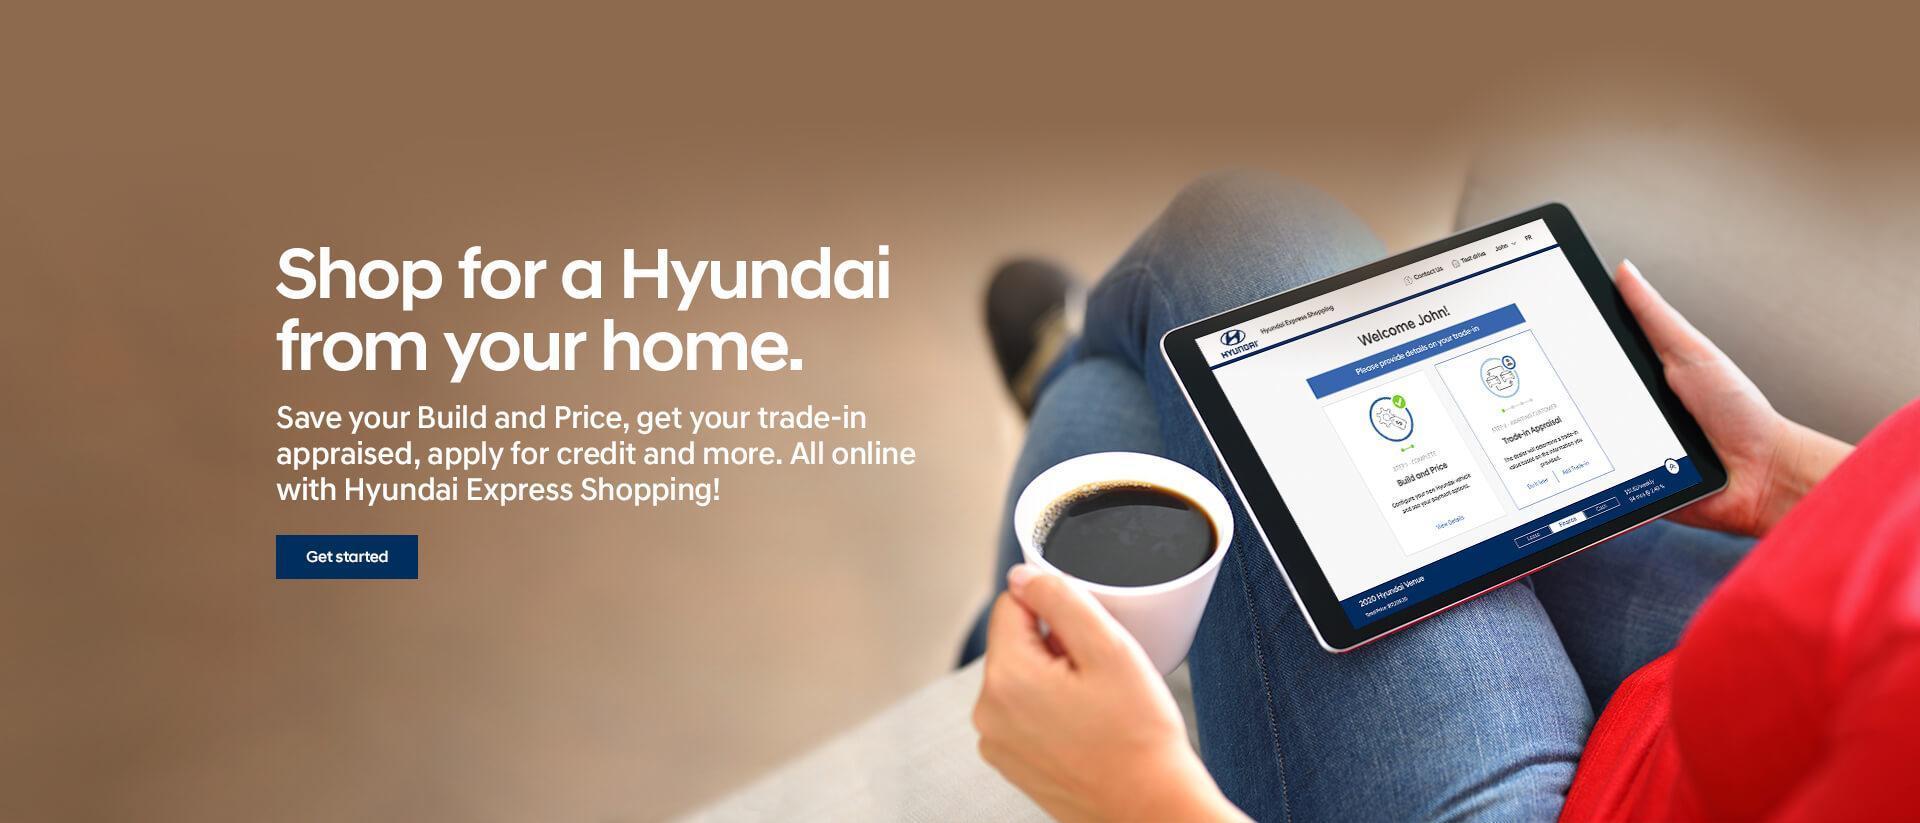 Shop from Home with Hyundai Express Shopping | Corey Hyundai